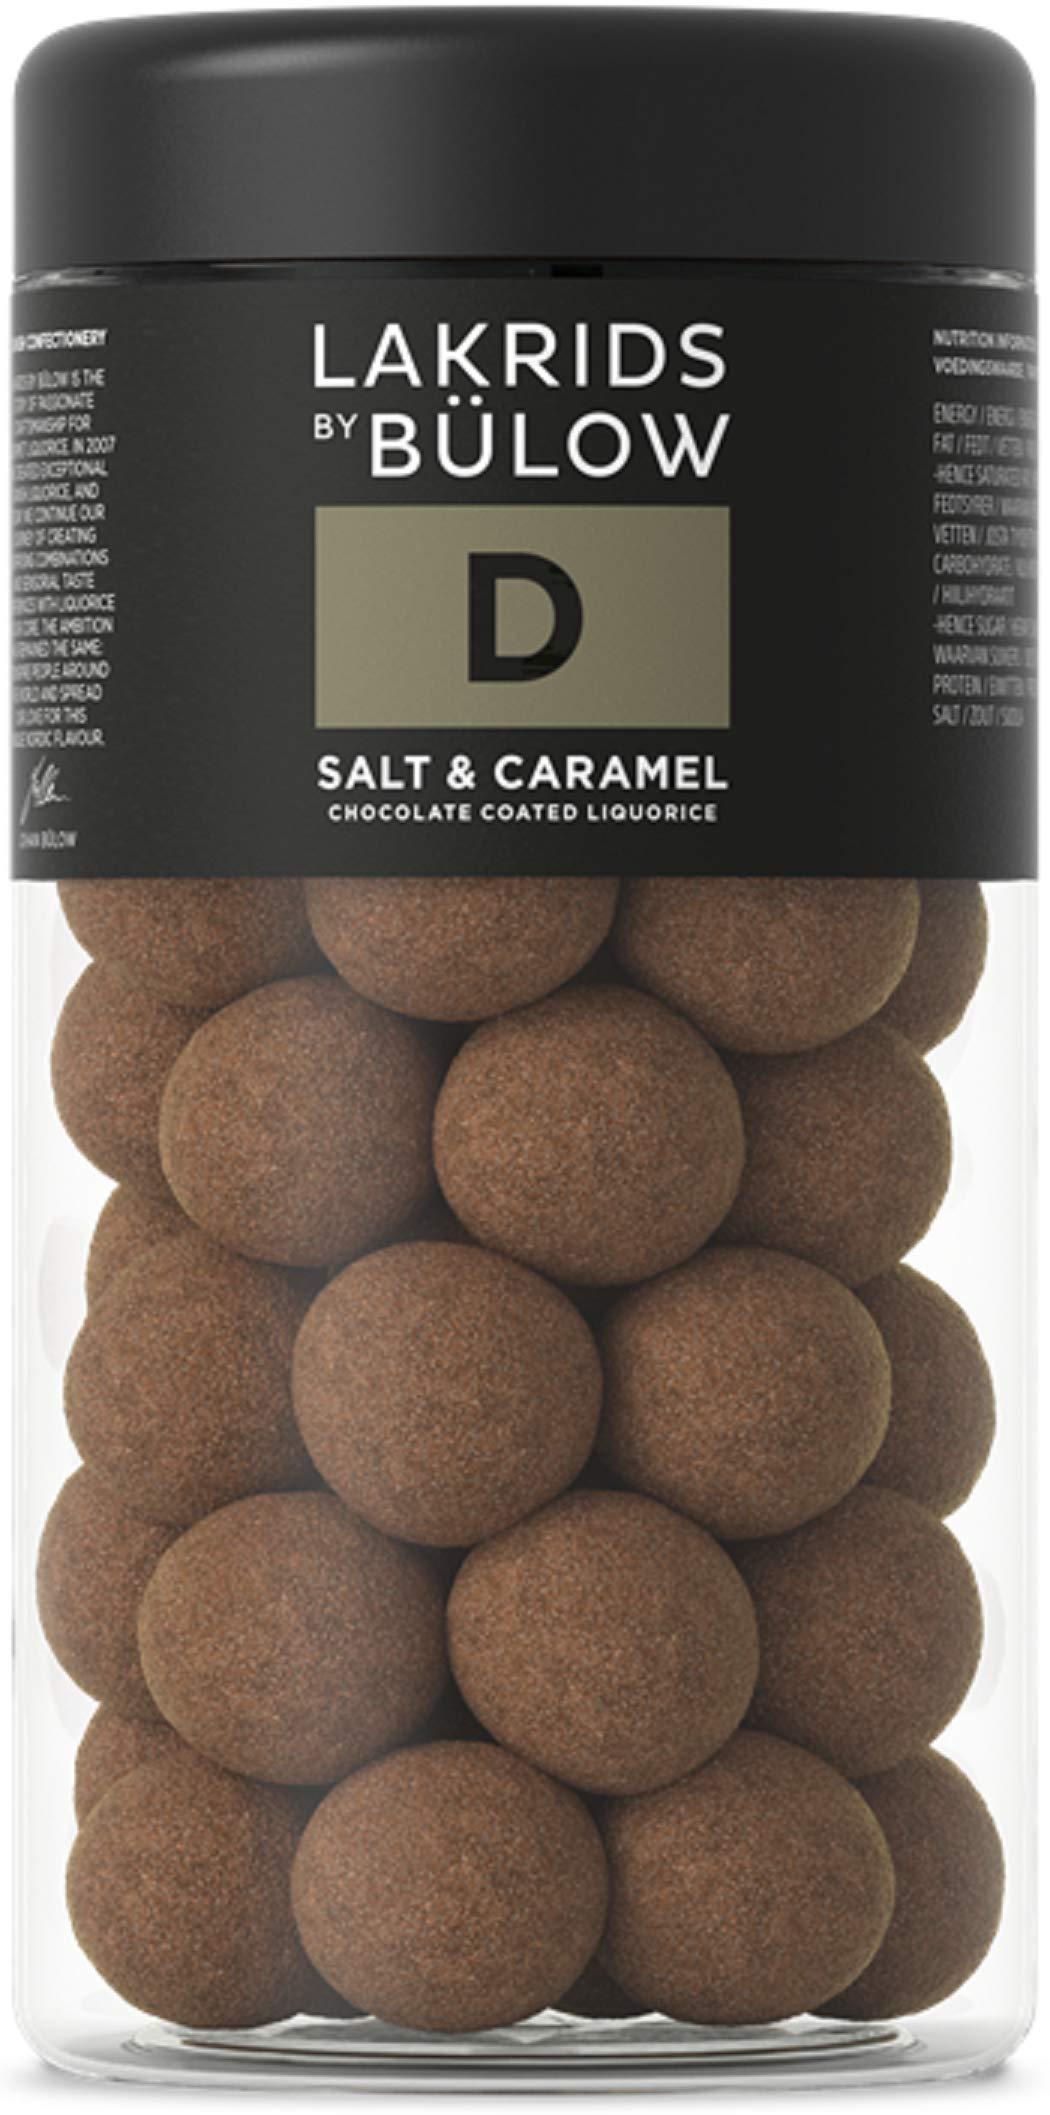 Lakrids by Johan Bülow D - Salt & Caramel Chocolate Coated Liquorice (265g) by Lakrids